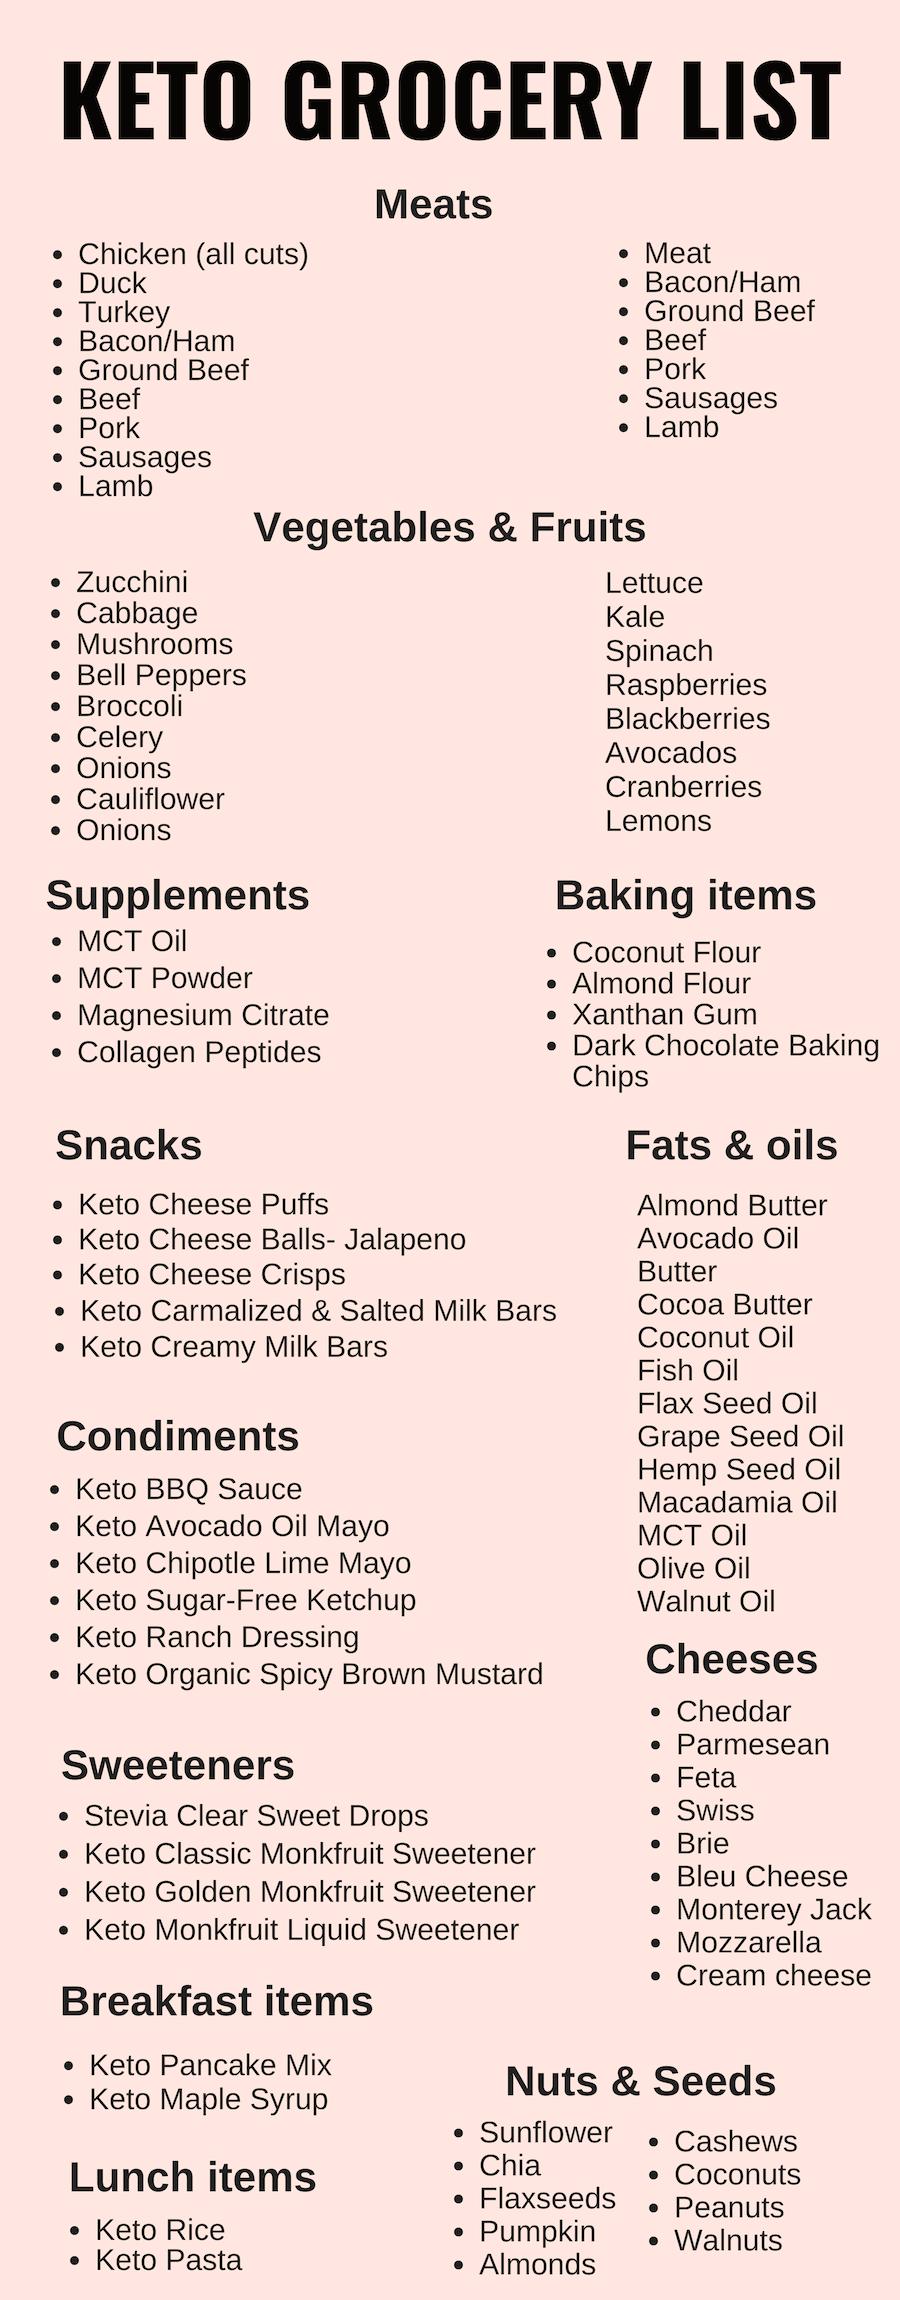 keto grocery list #keto #ketodiet